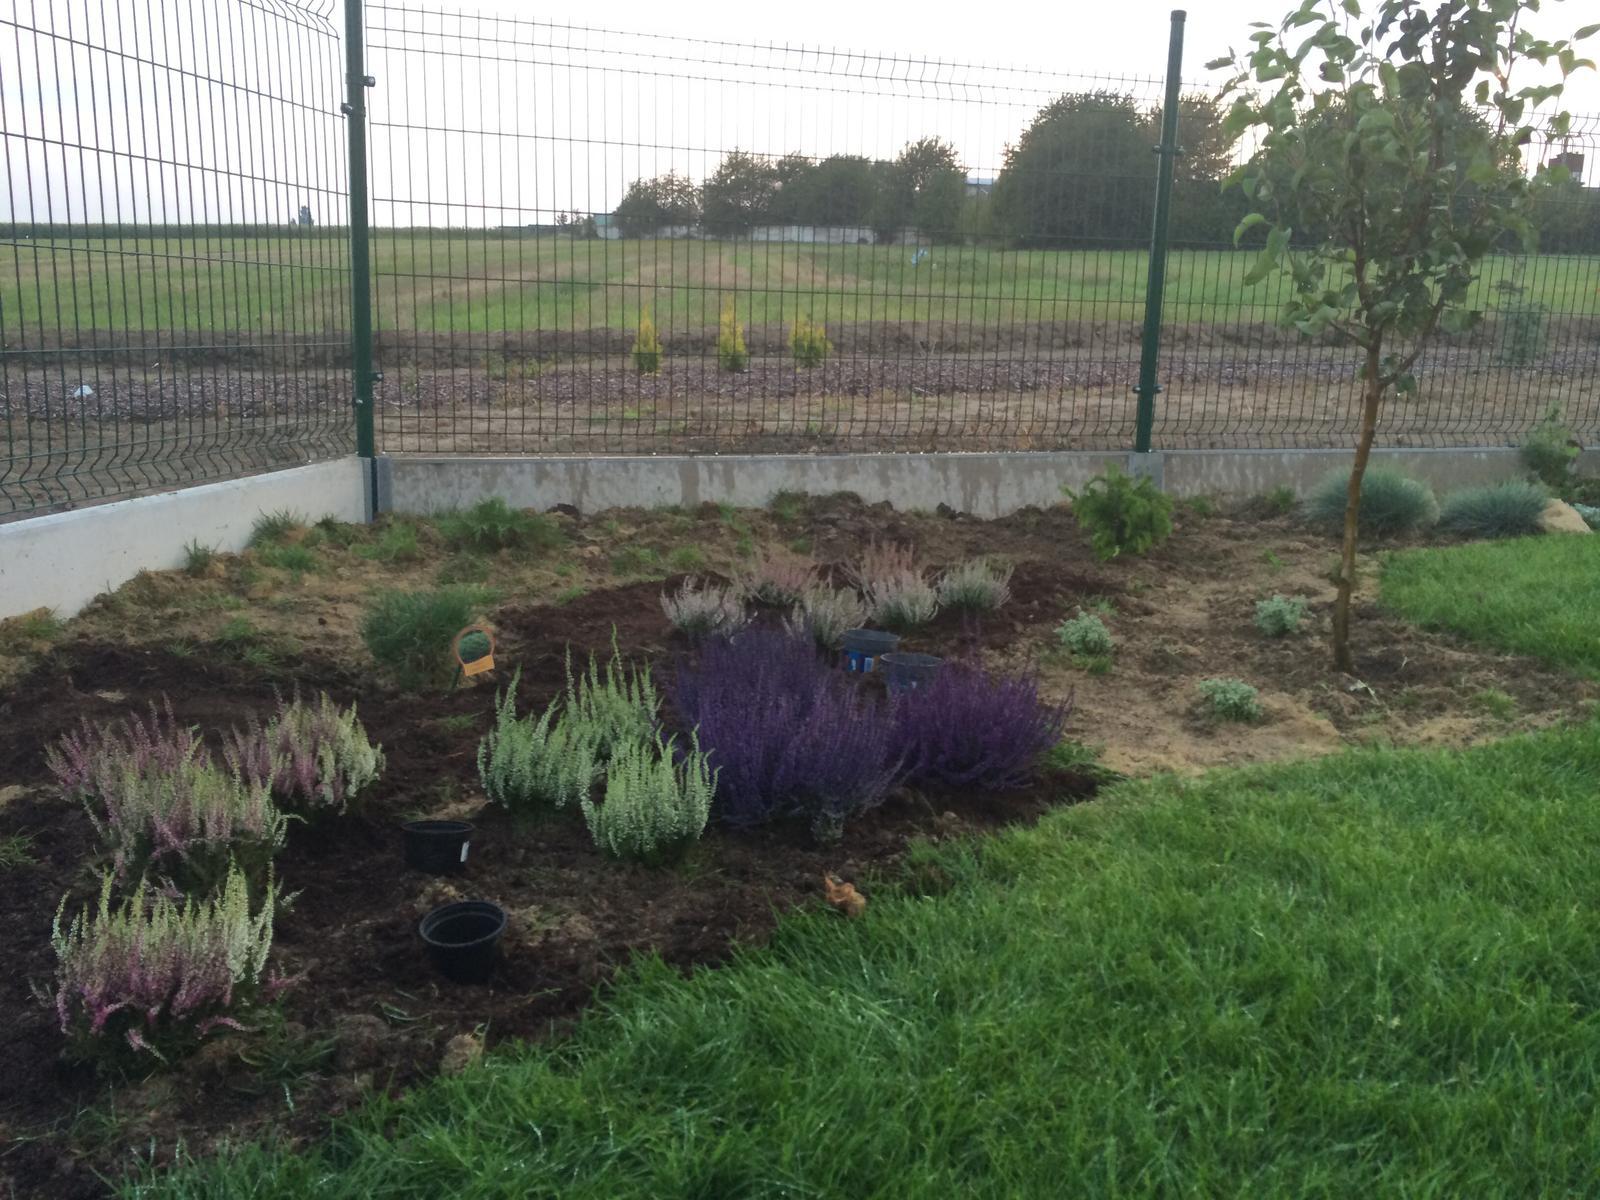 Zahradka nasa 2015 - Po presadeni som zistila ze fialove su umelo ofarbene :( cele kvetinace boli cialove od farby :( takze mame biele 4x drahsie :-/